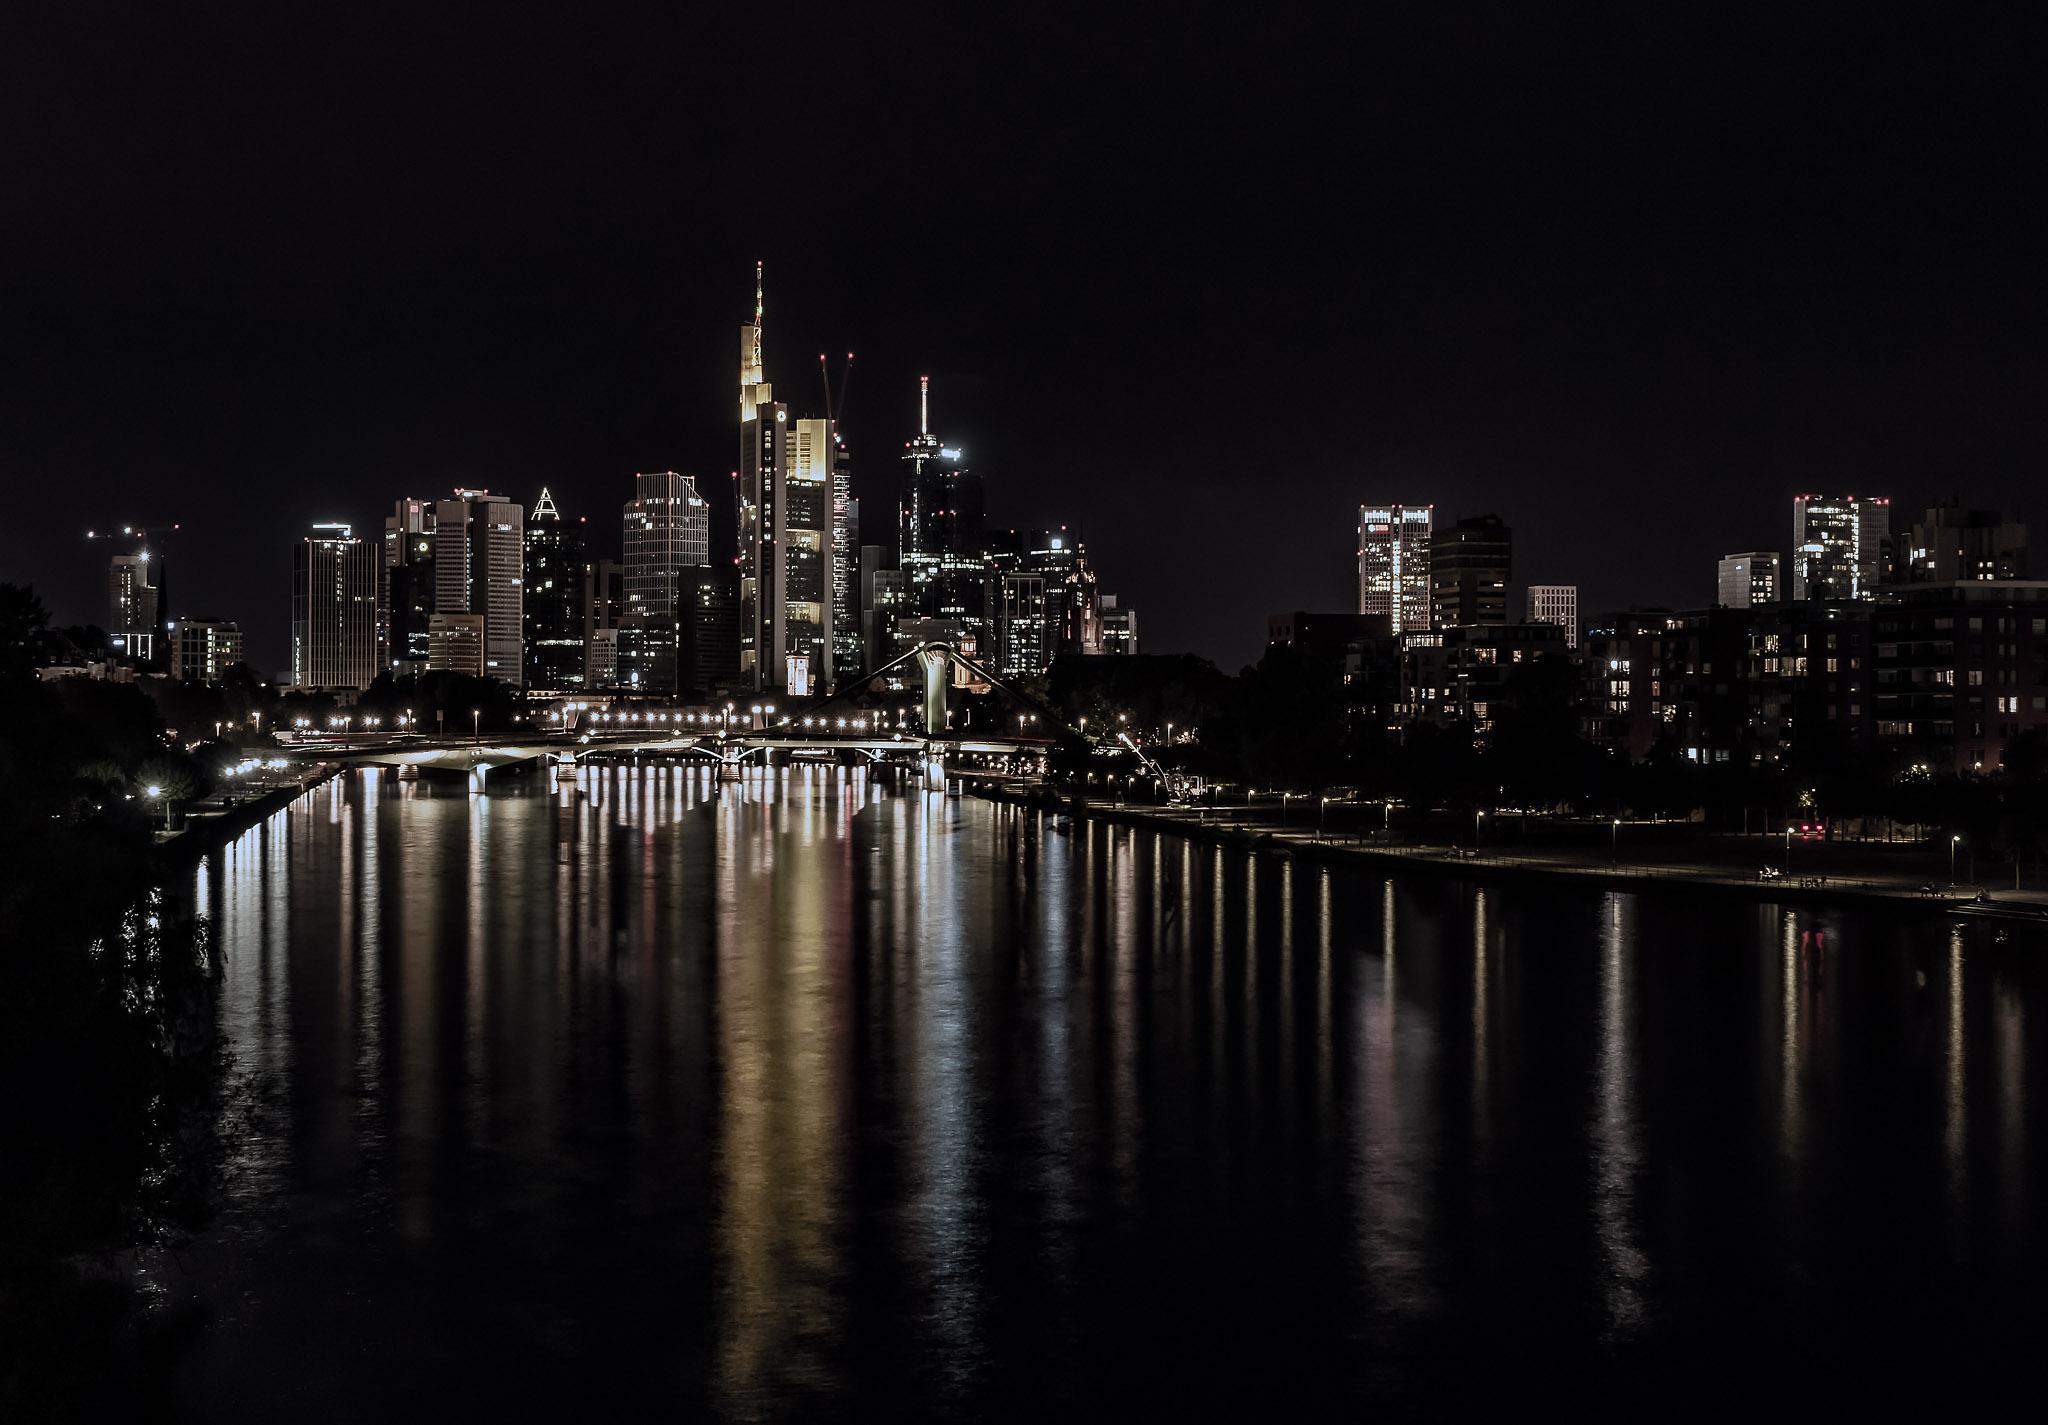 Frankfurt am Main - Nachtfotografie